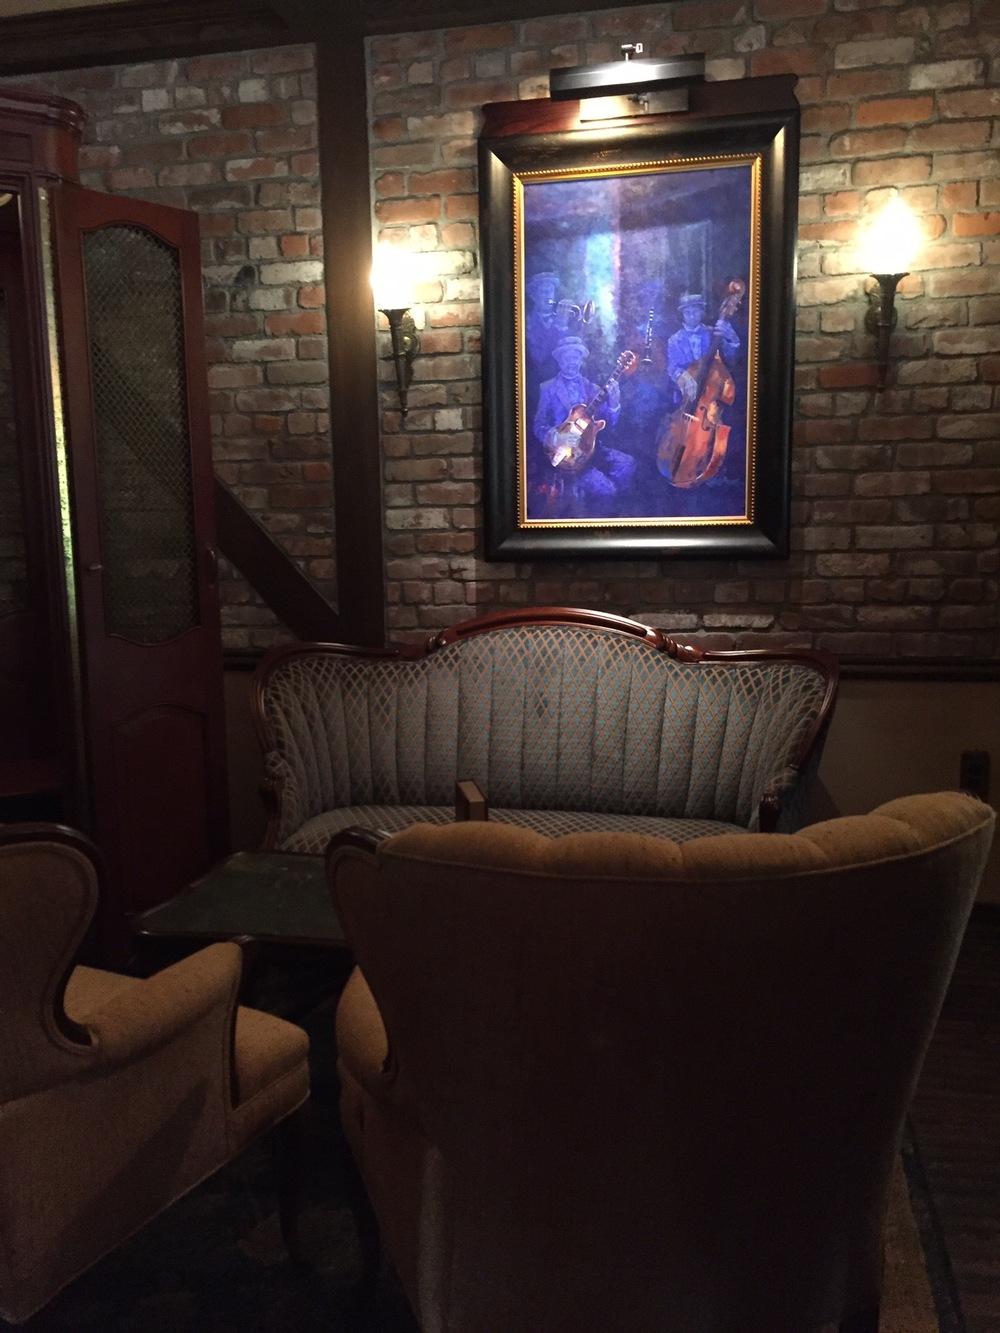 My Visit to Club 33 - Part 3 DisneyDaze.com